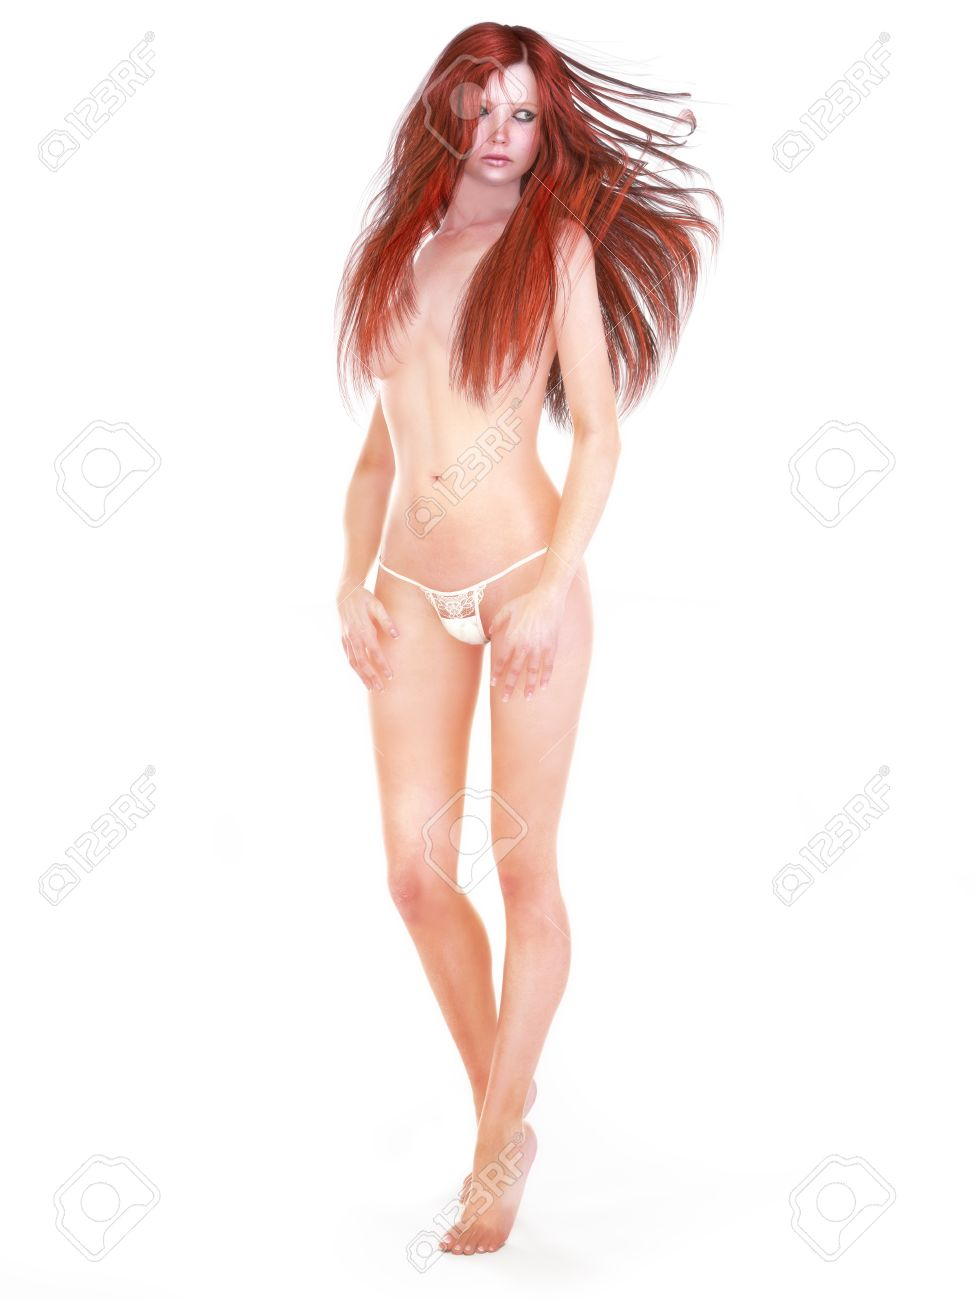 Hannah montana goes nude